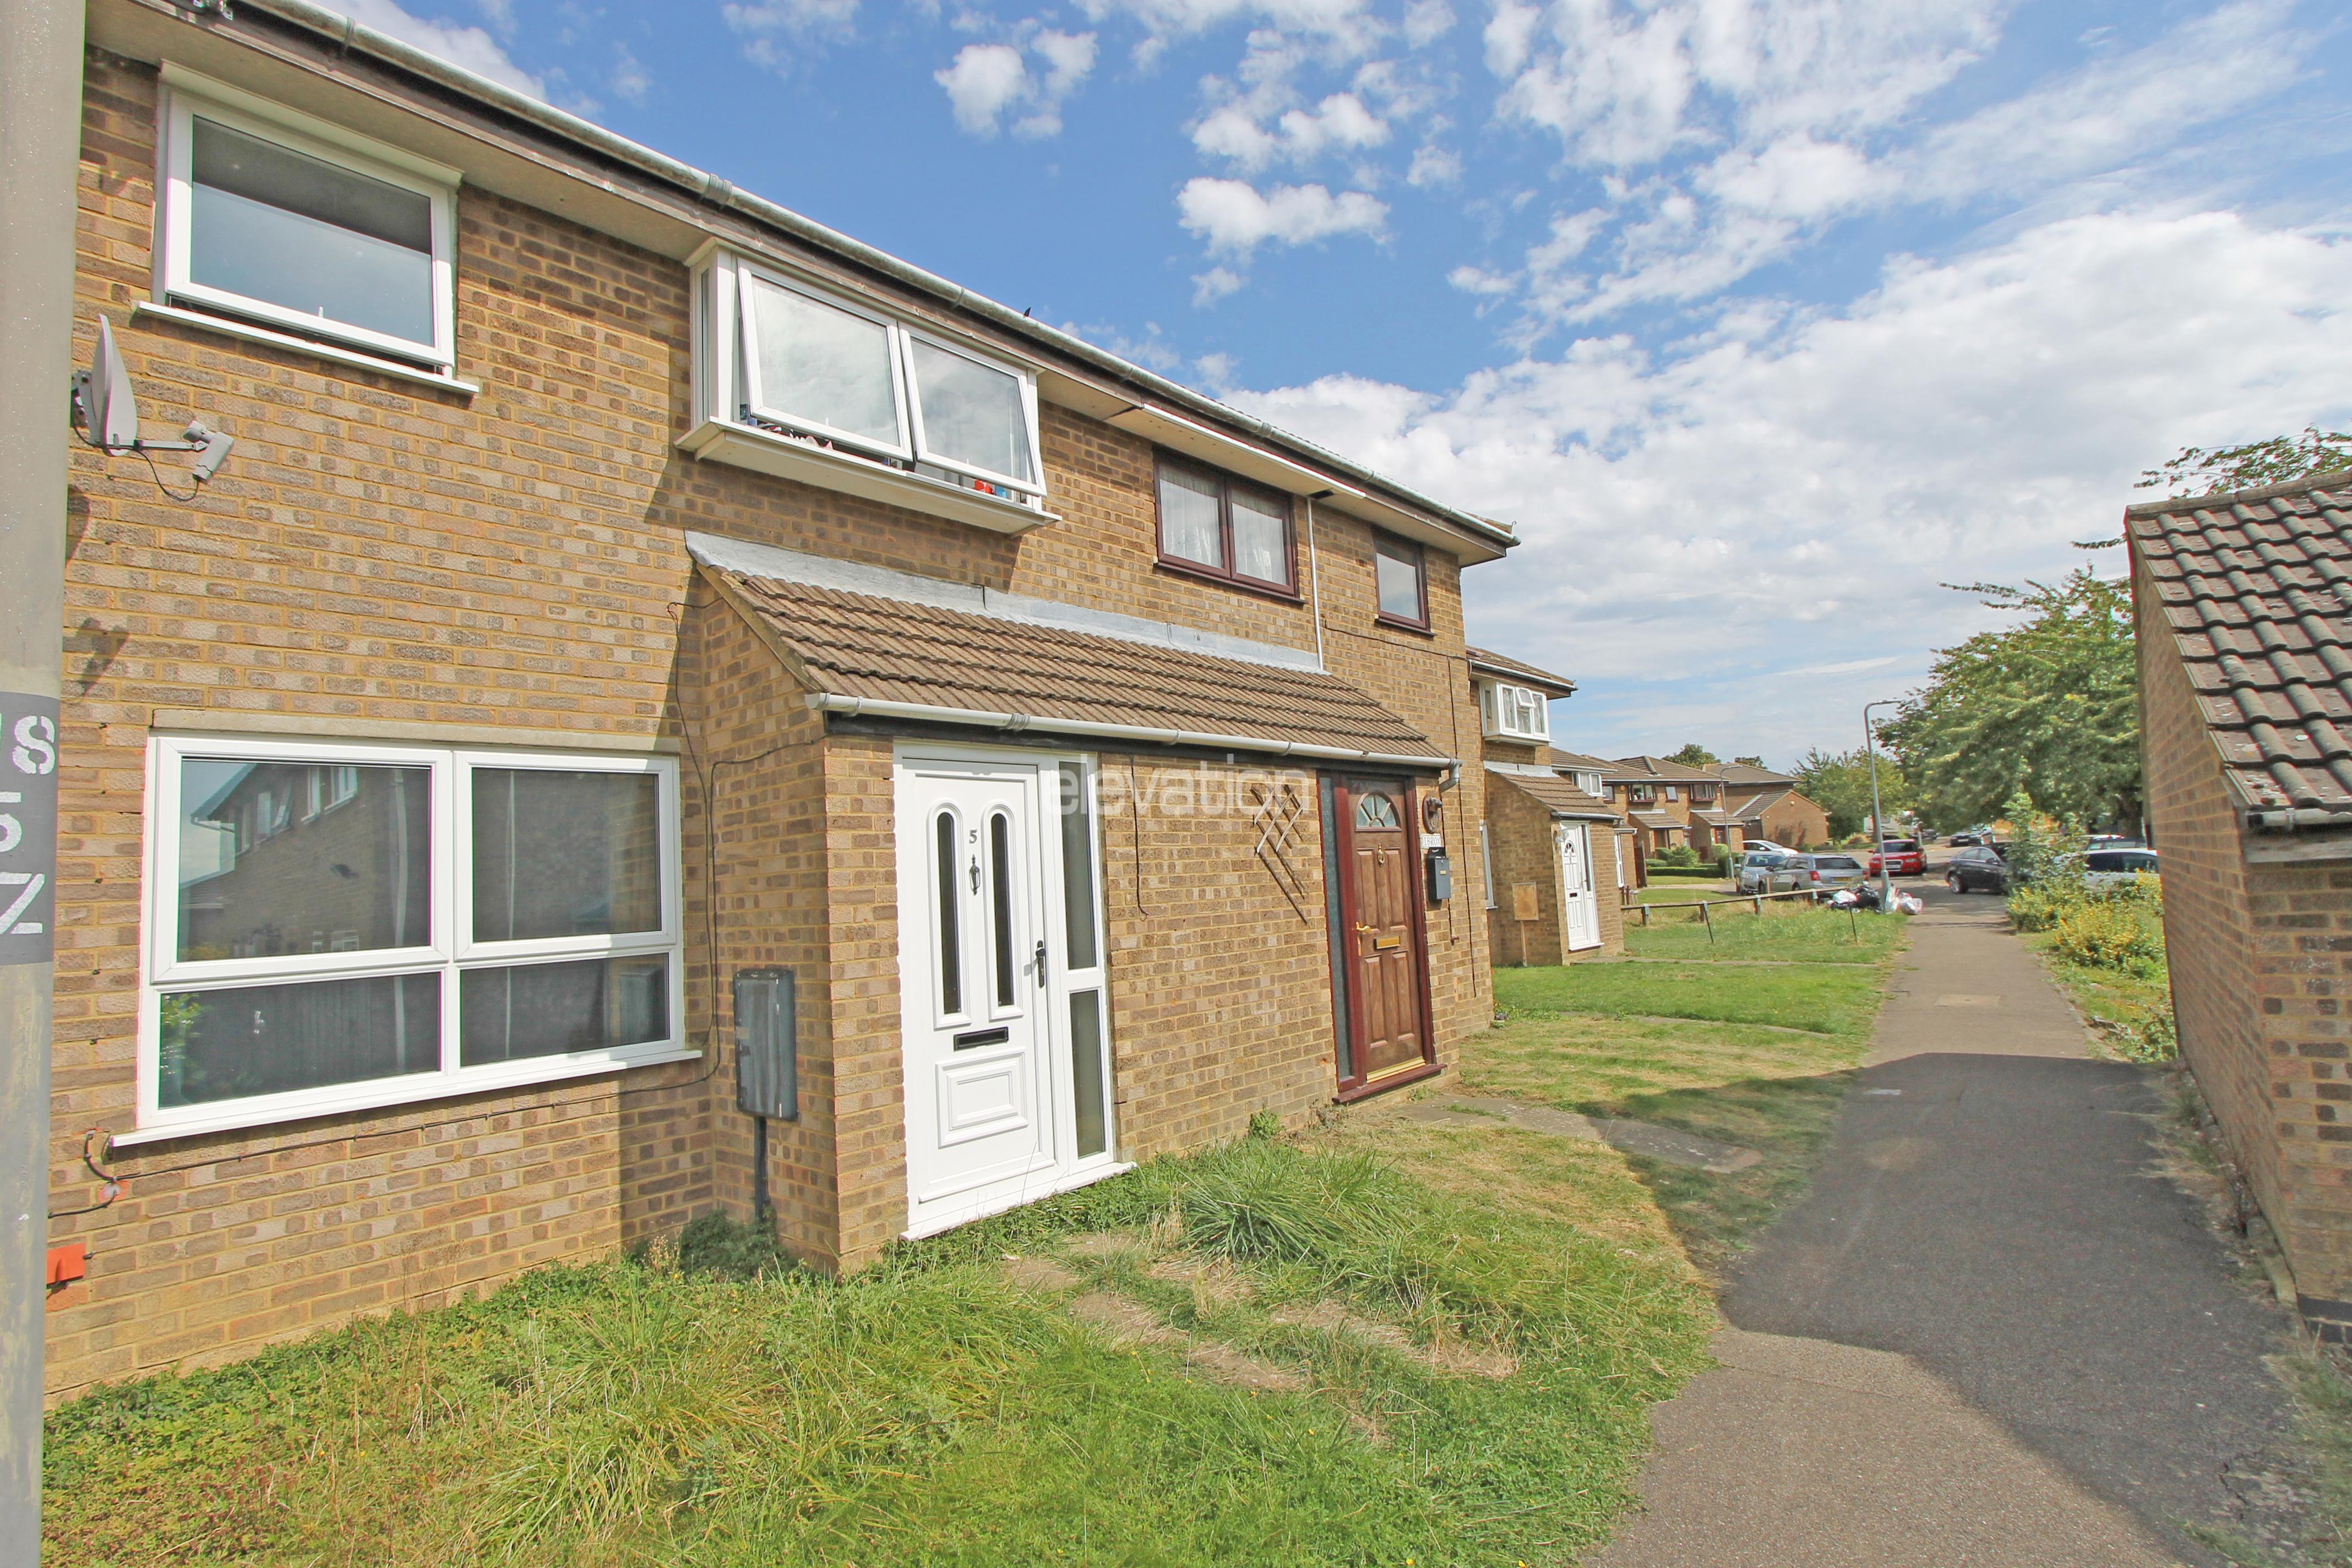 Elmhurst Close, Milton Keynes, Buckinghamshire Image